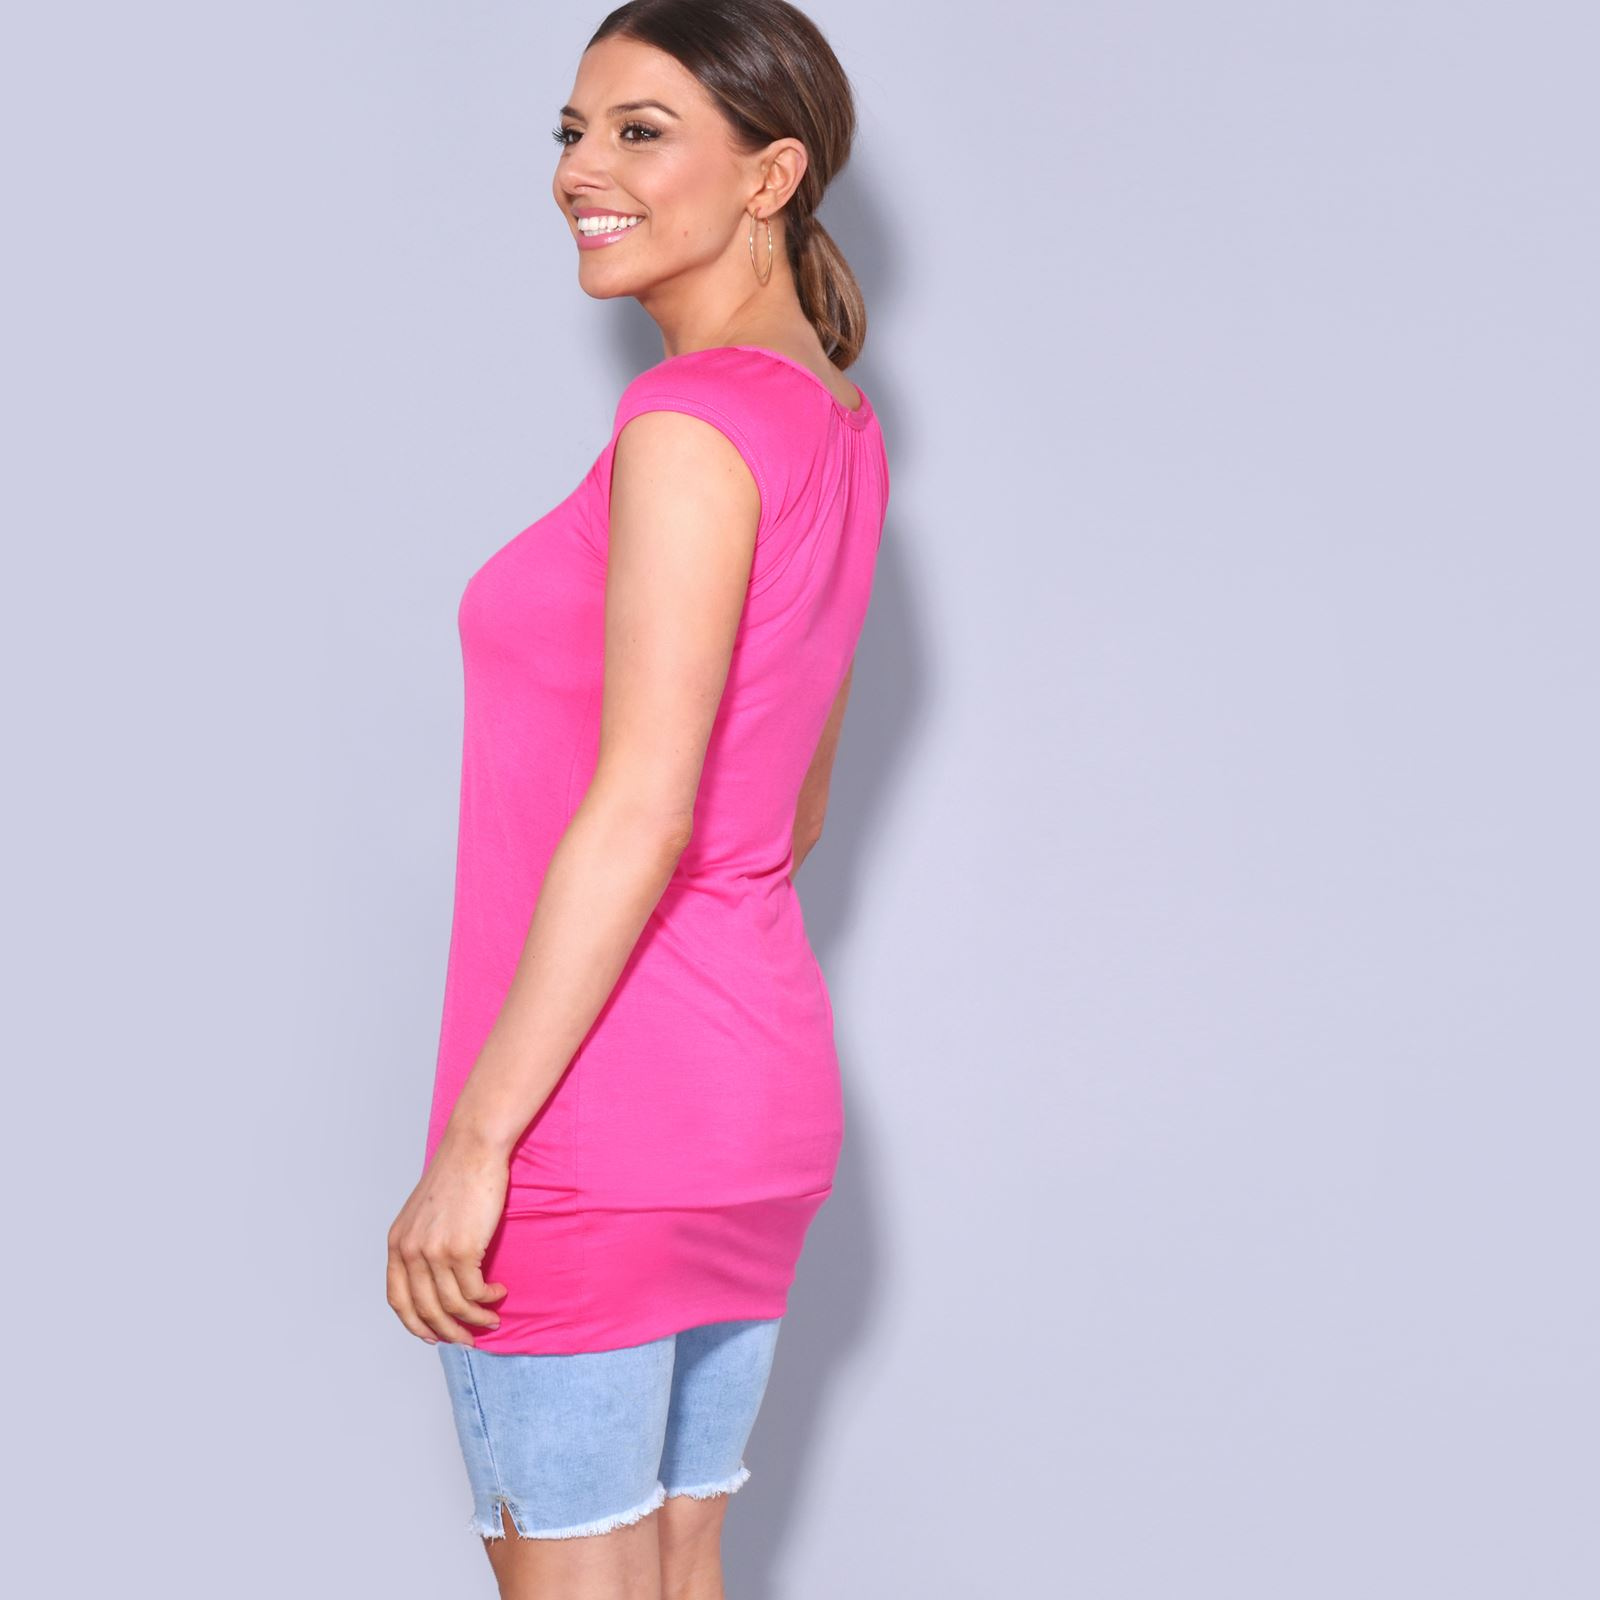 Womens-Ladies-Scoop-Neck-Blouse-V-T-Shirt-Long-Short-Sleeve-Plain-Loose-Top thumbnail 12